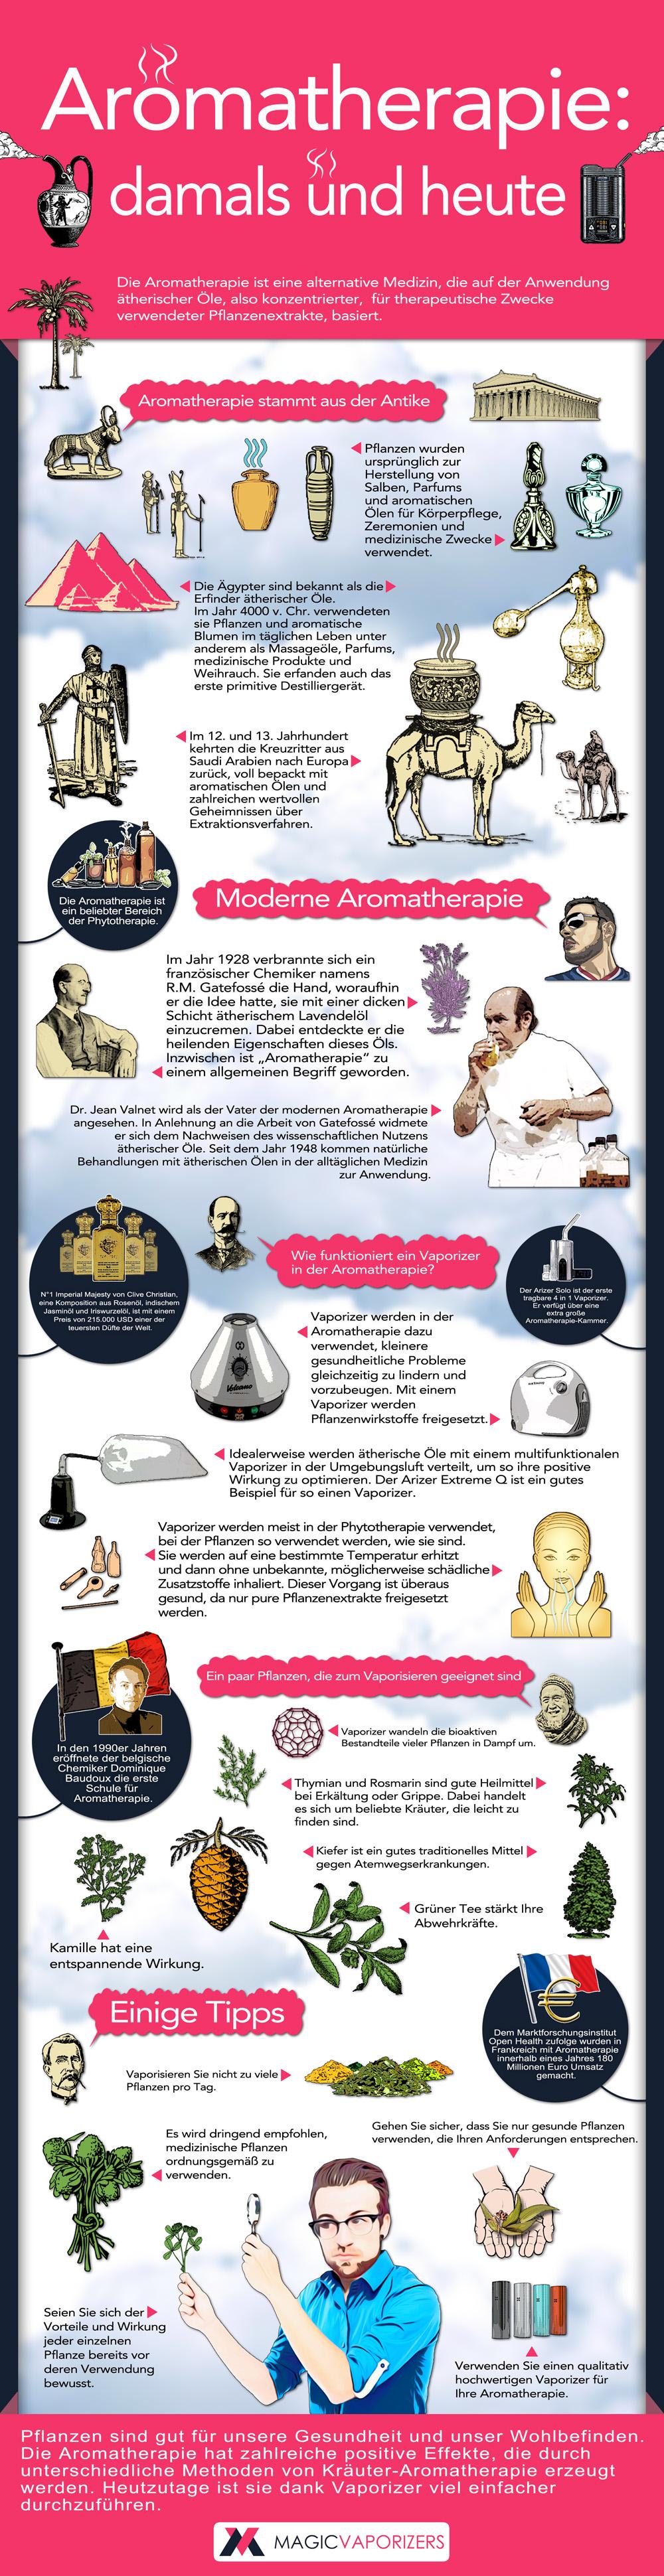 Aromatherapie Infographic in German for Magic Vaporizers